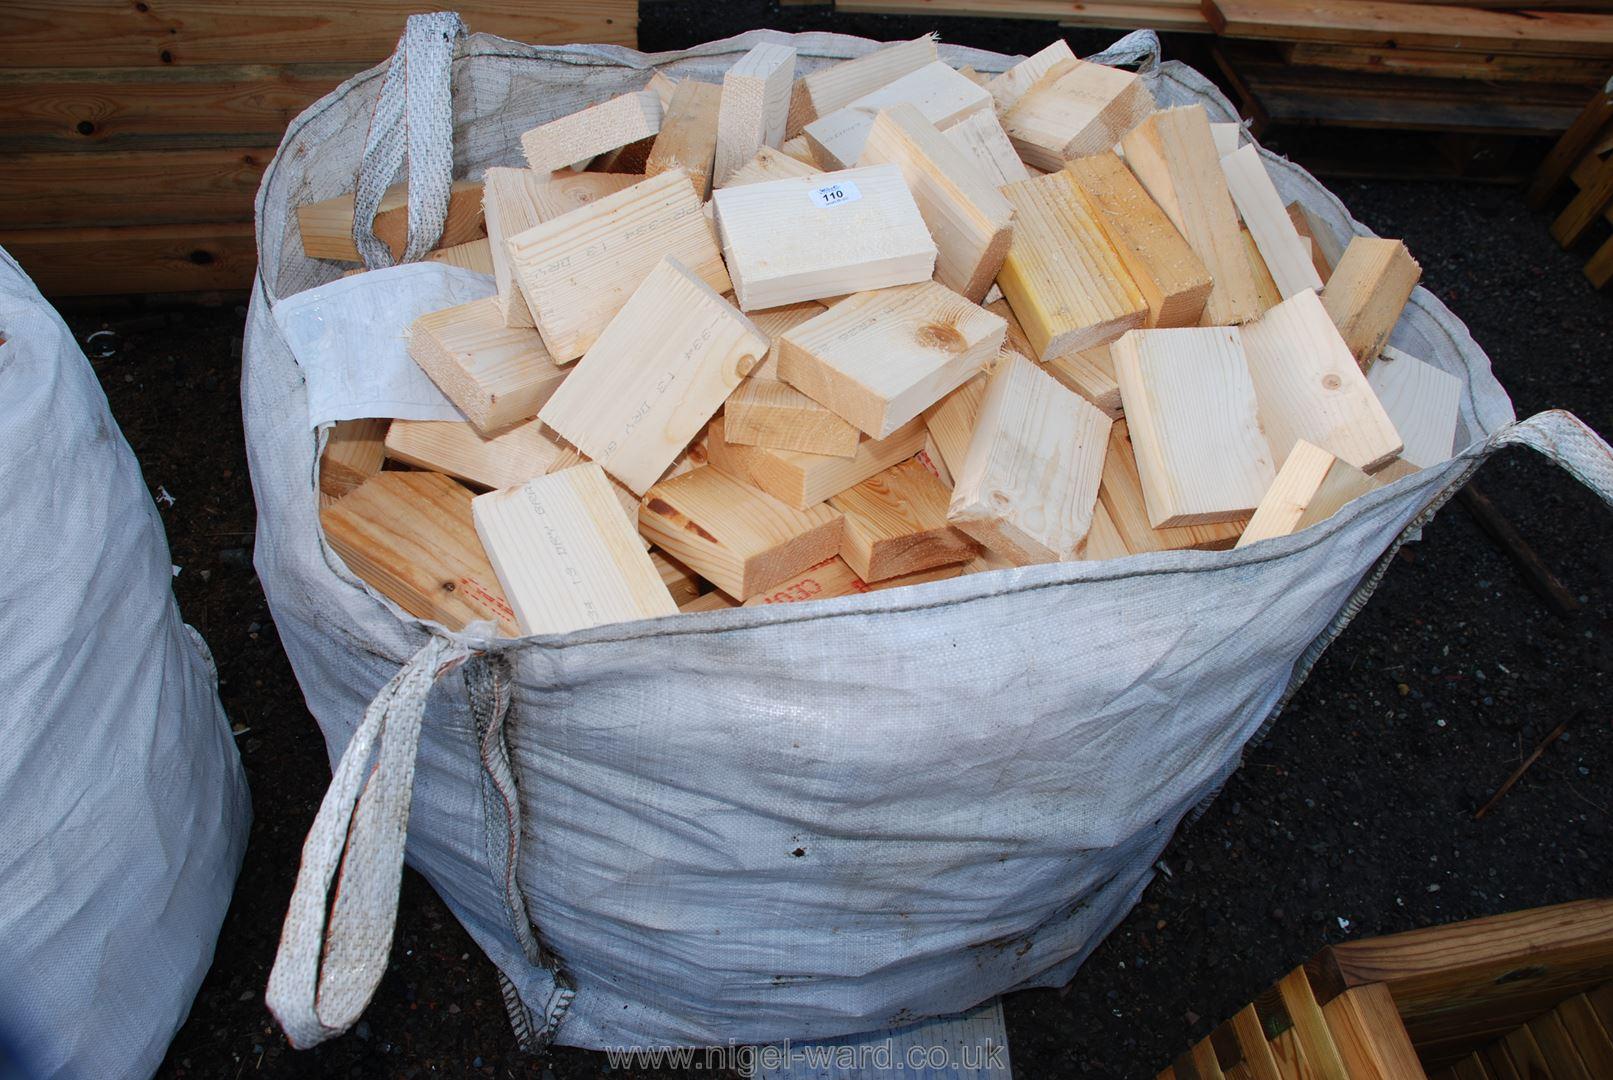 Bag of softwood logs.